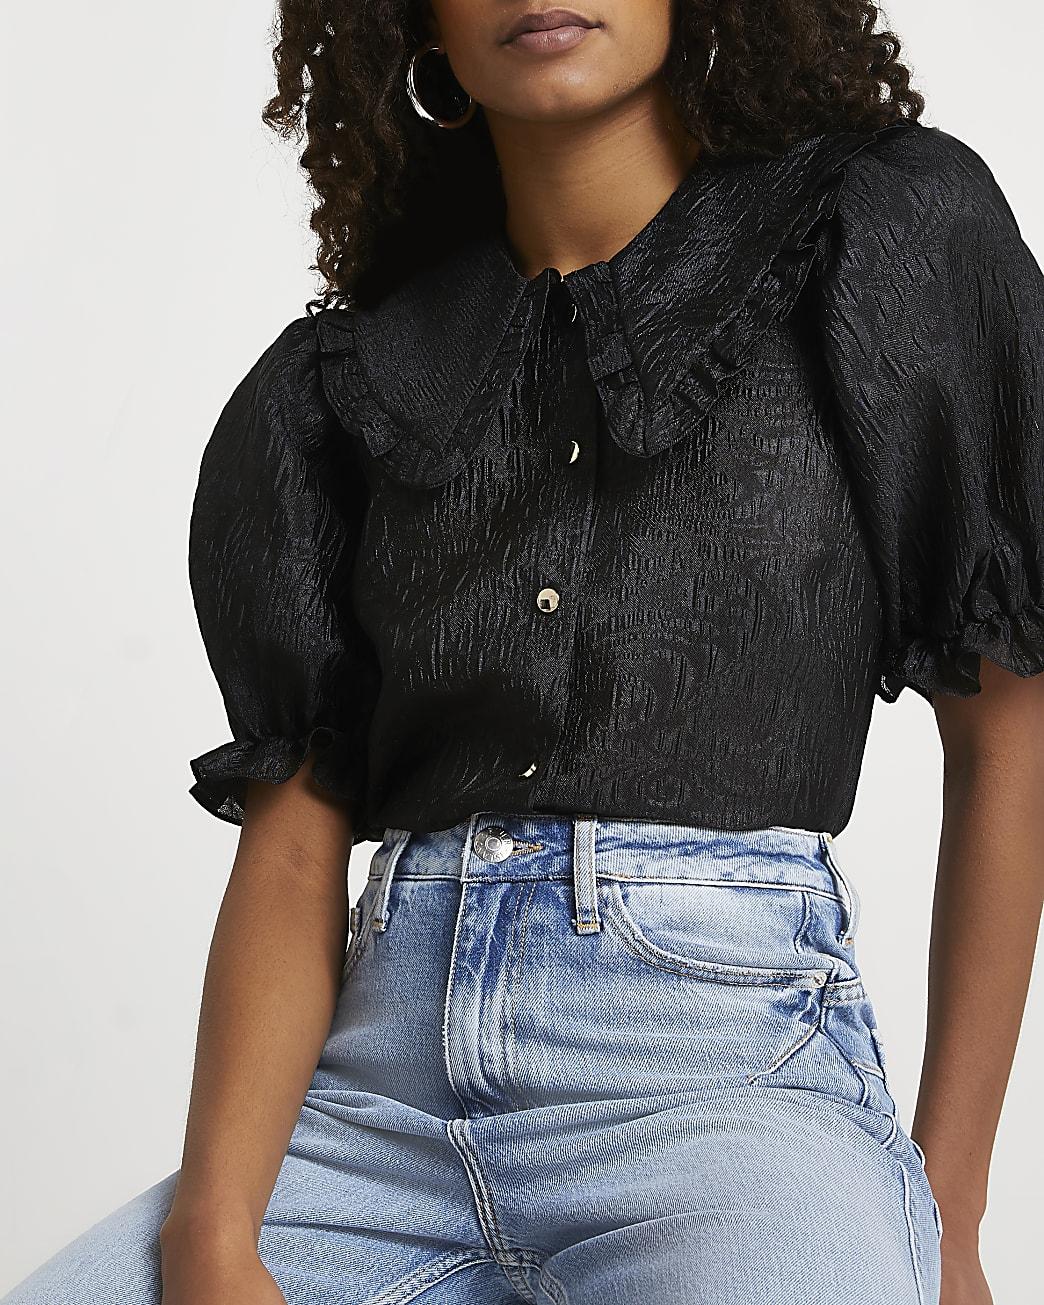 Black short sleeve collar top